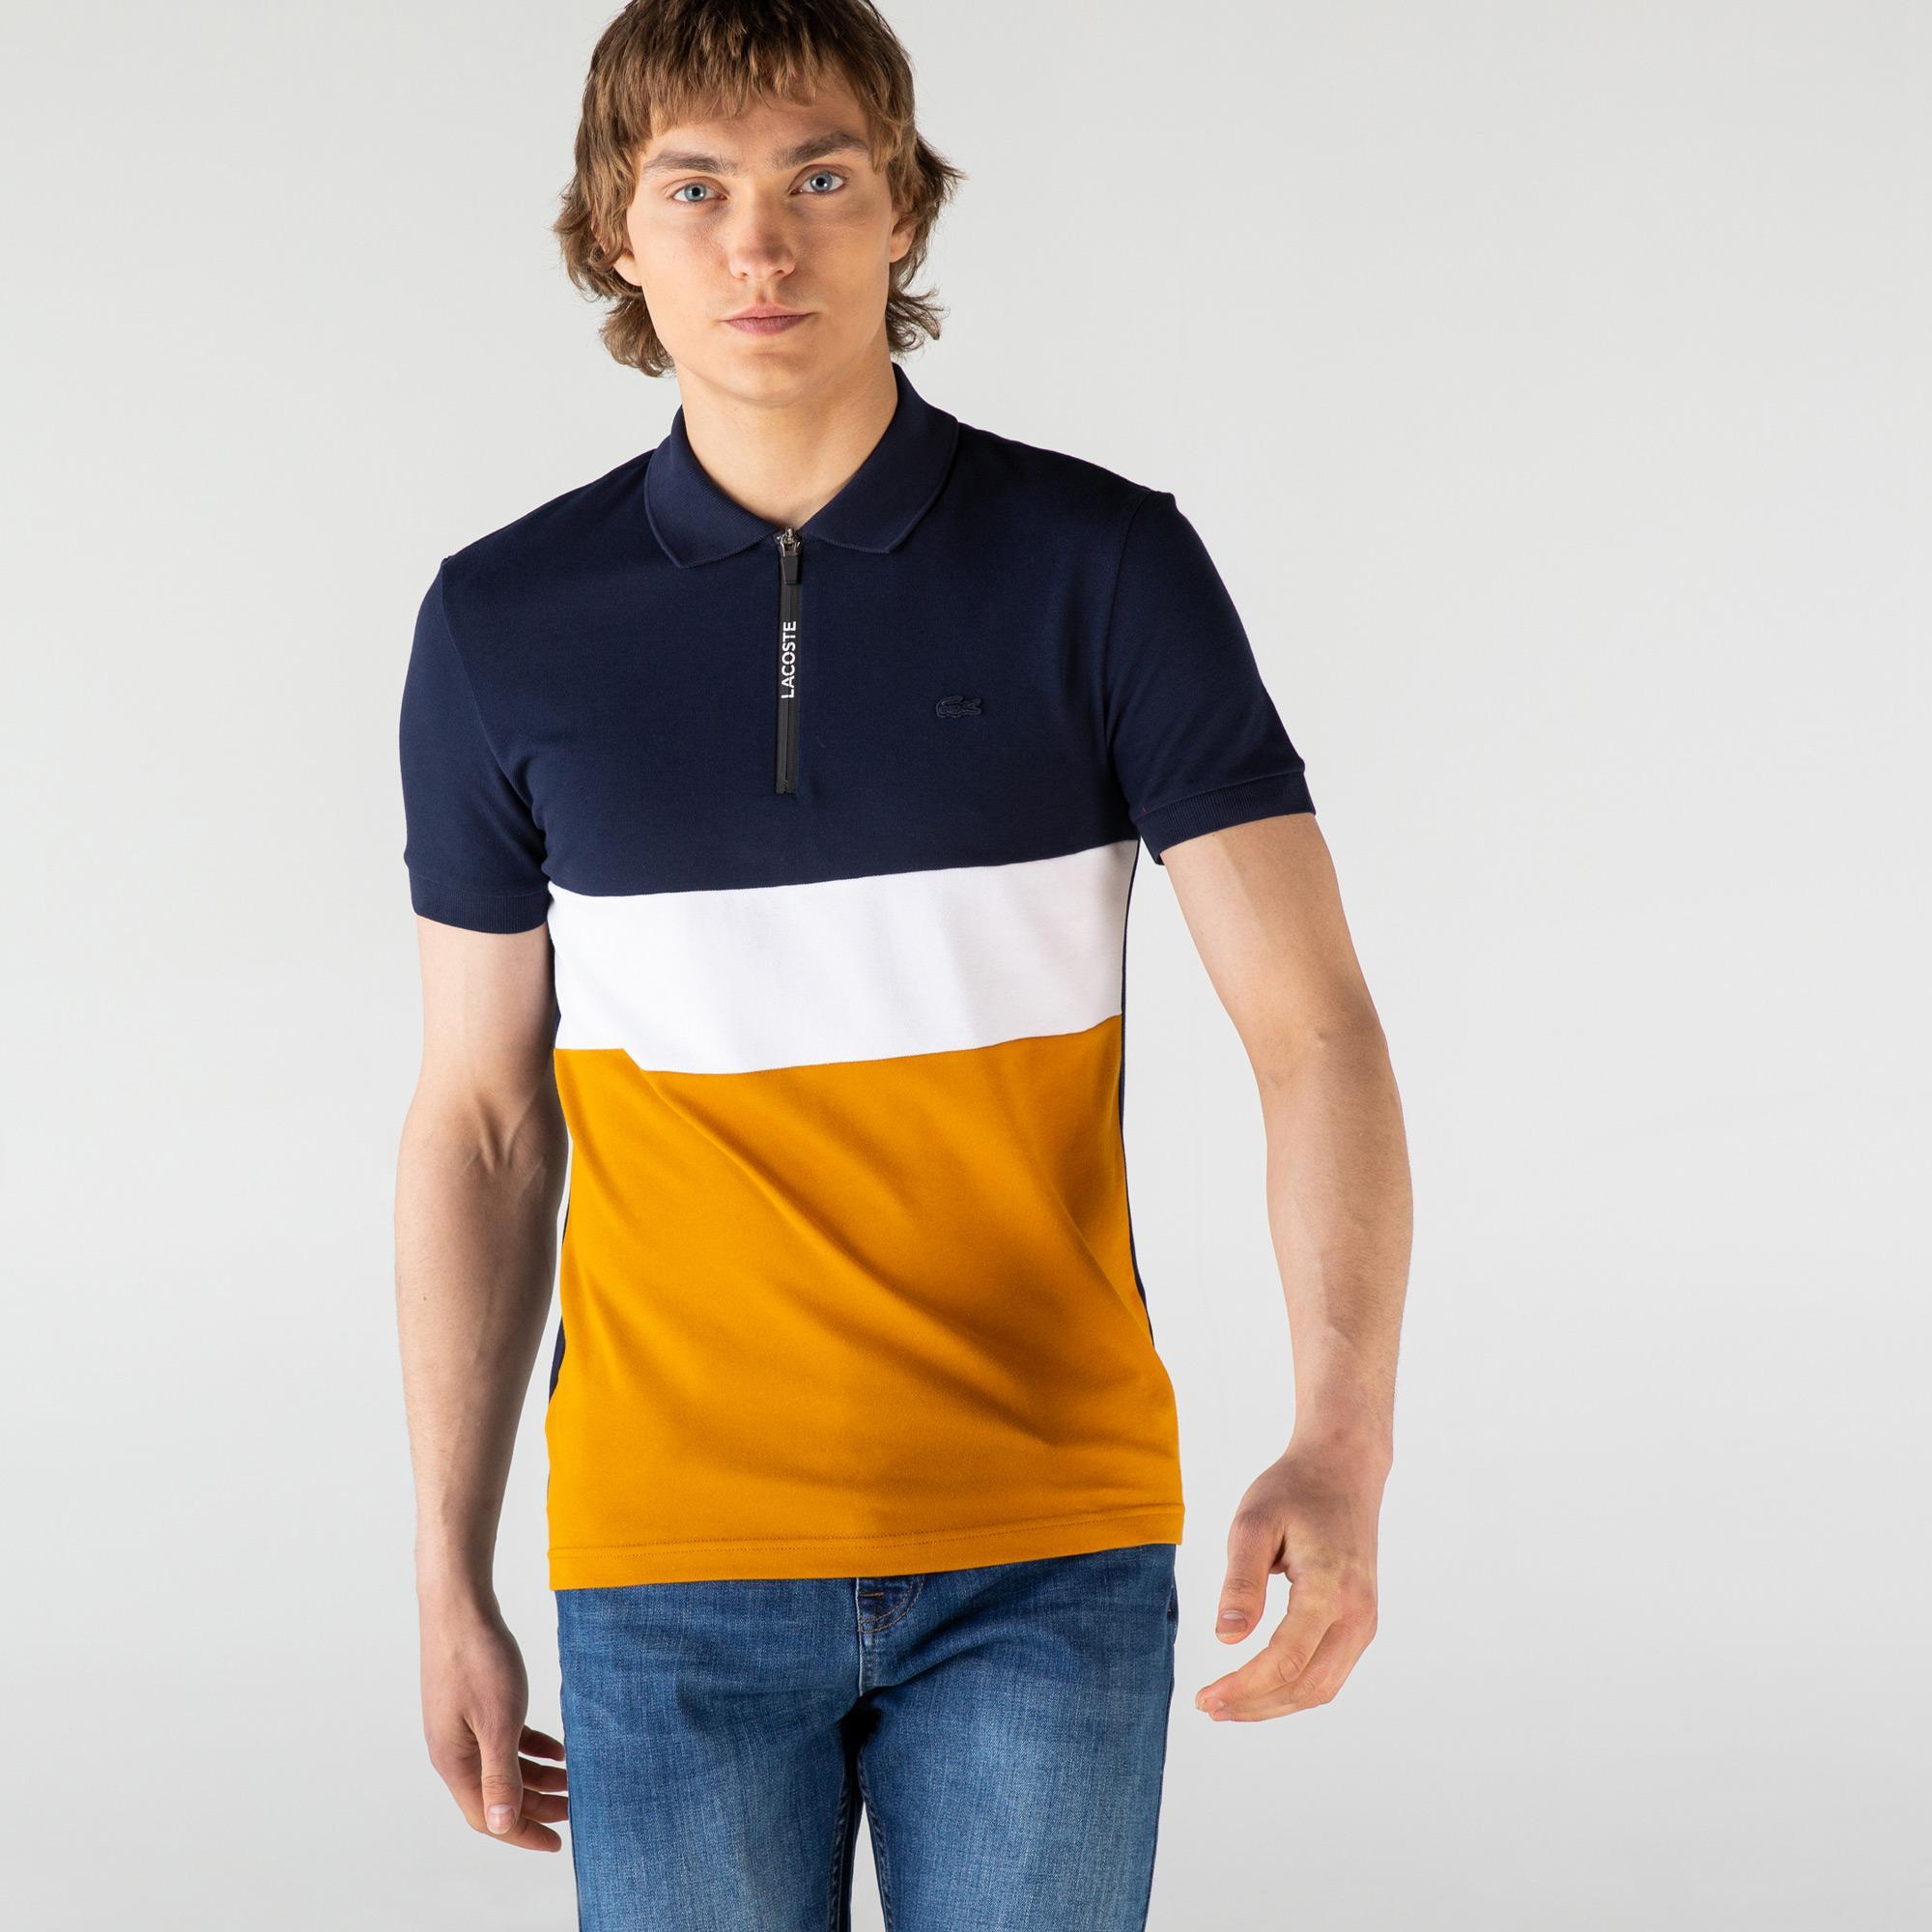 Lacoste Erkek Slim Fit Fermuar Yaka Renk Bloklu Renkli Polo